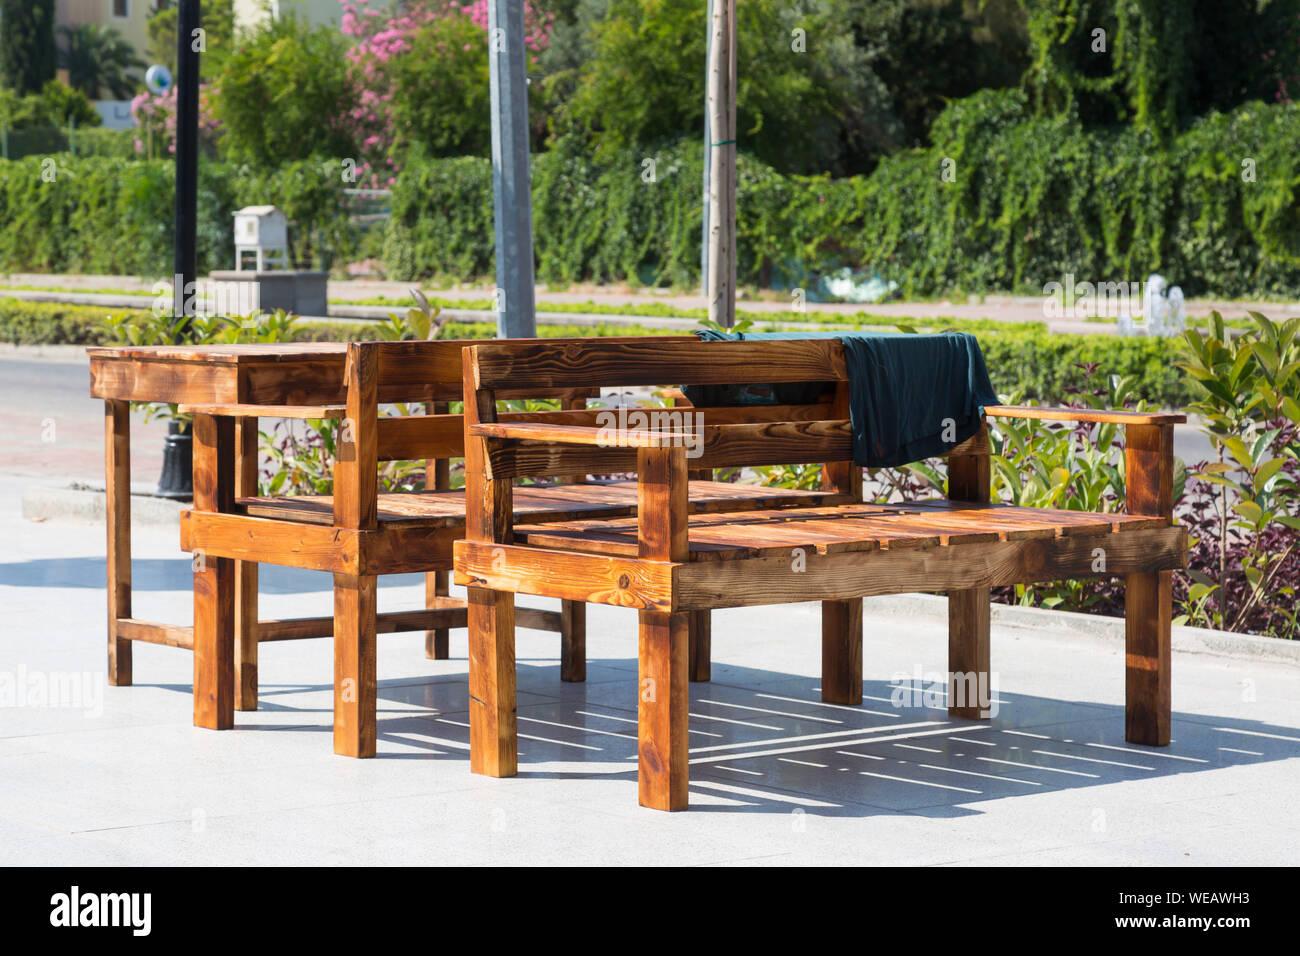 Strange Two Wooden Benches Stock Photos Two Wooden Benches Stock Spiritservingveterans Wood Chair Design Ideas Spiritservingveteransorg